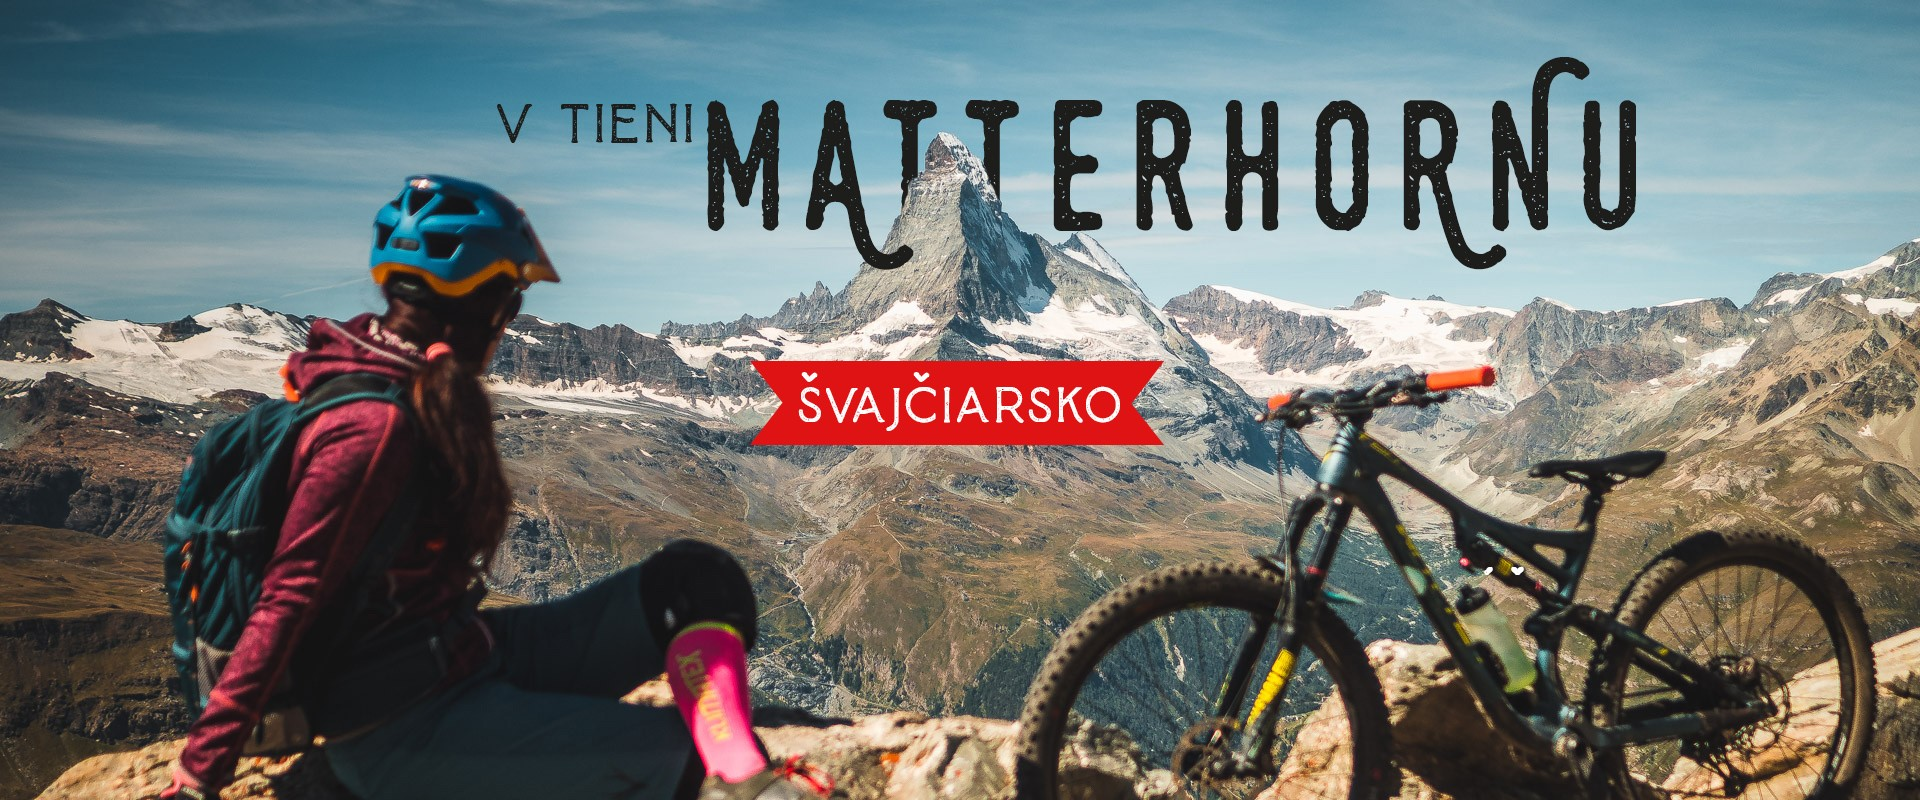 Traily v tieni Matterhornu